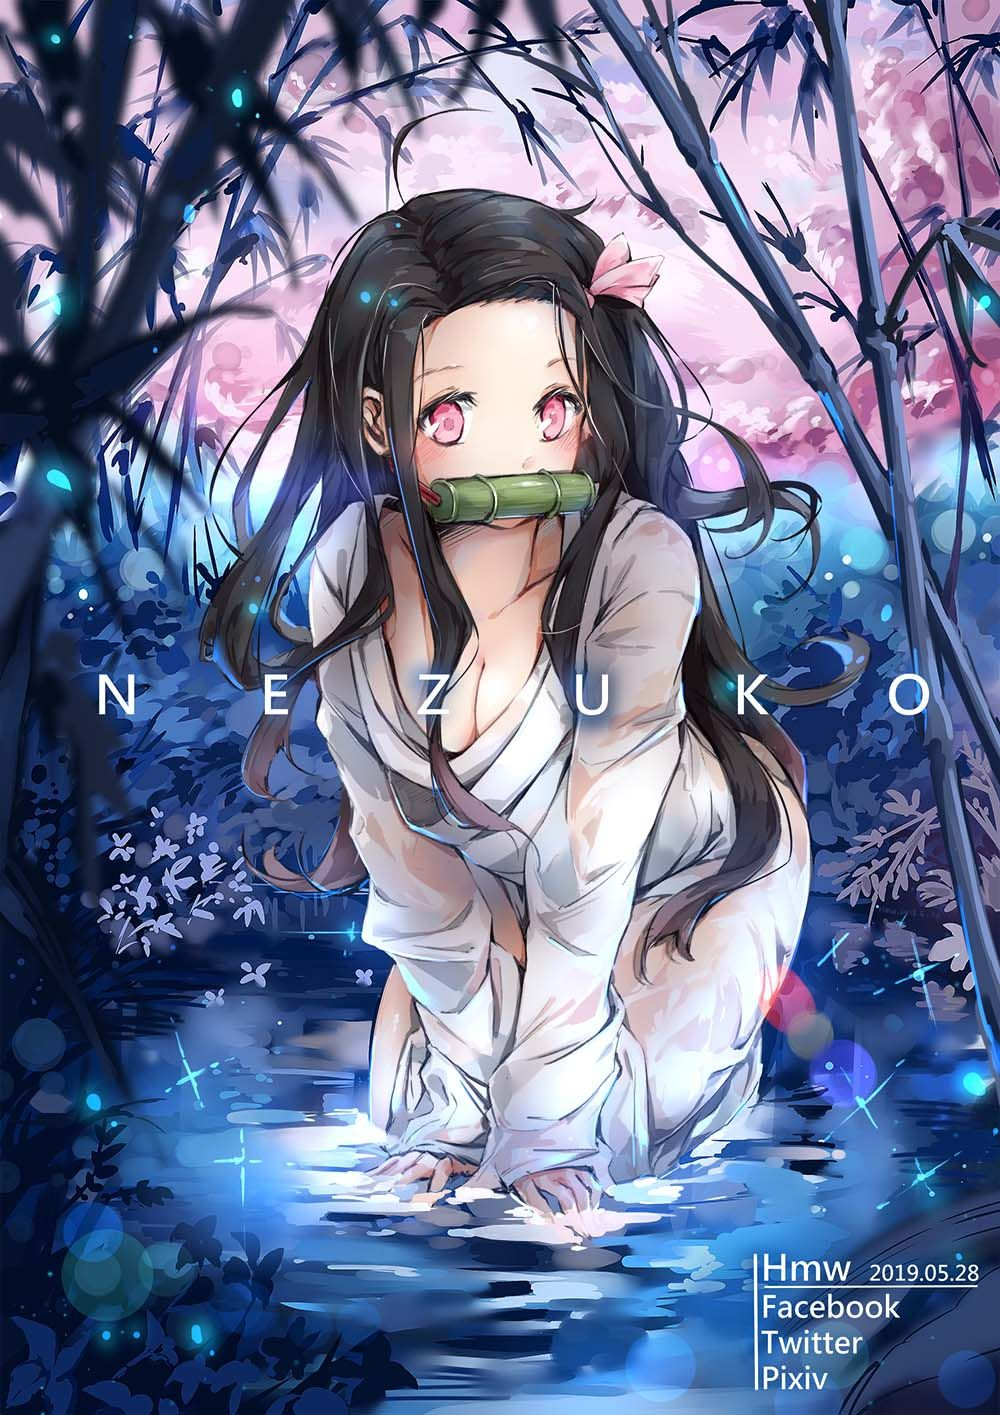 Goddess [Kimetsu no Yaiba] Anime in 2019 Anime, Anime